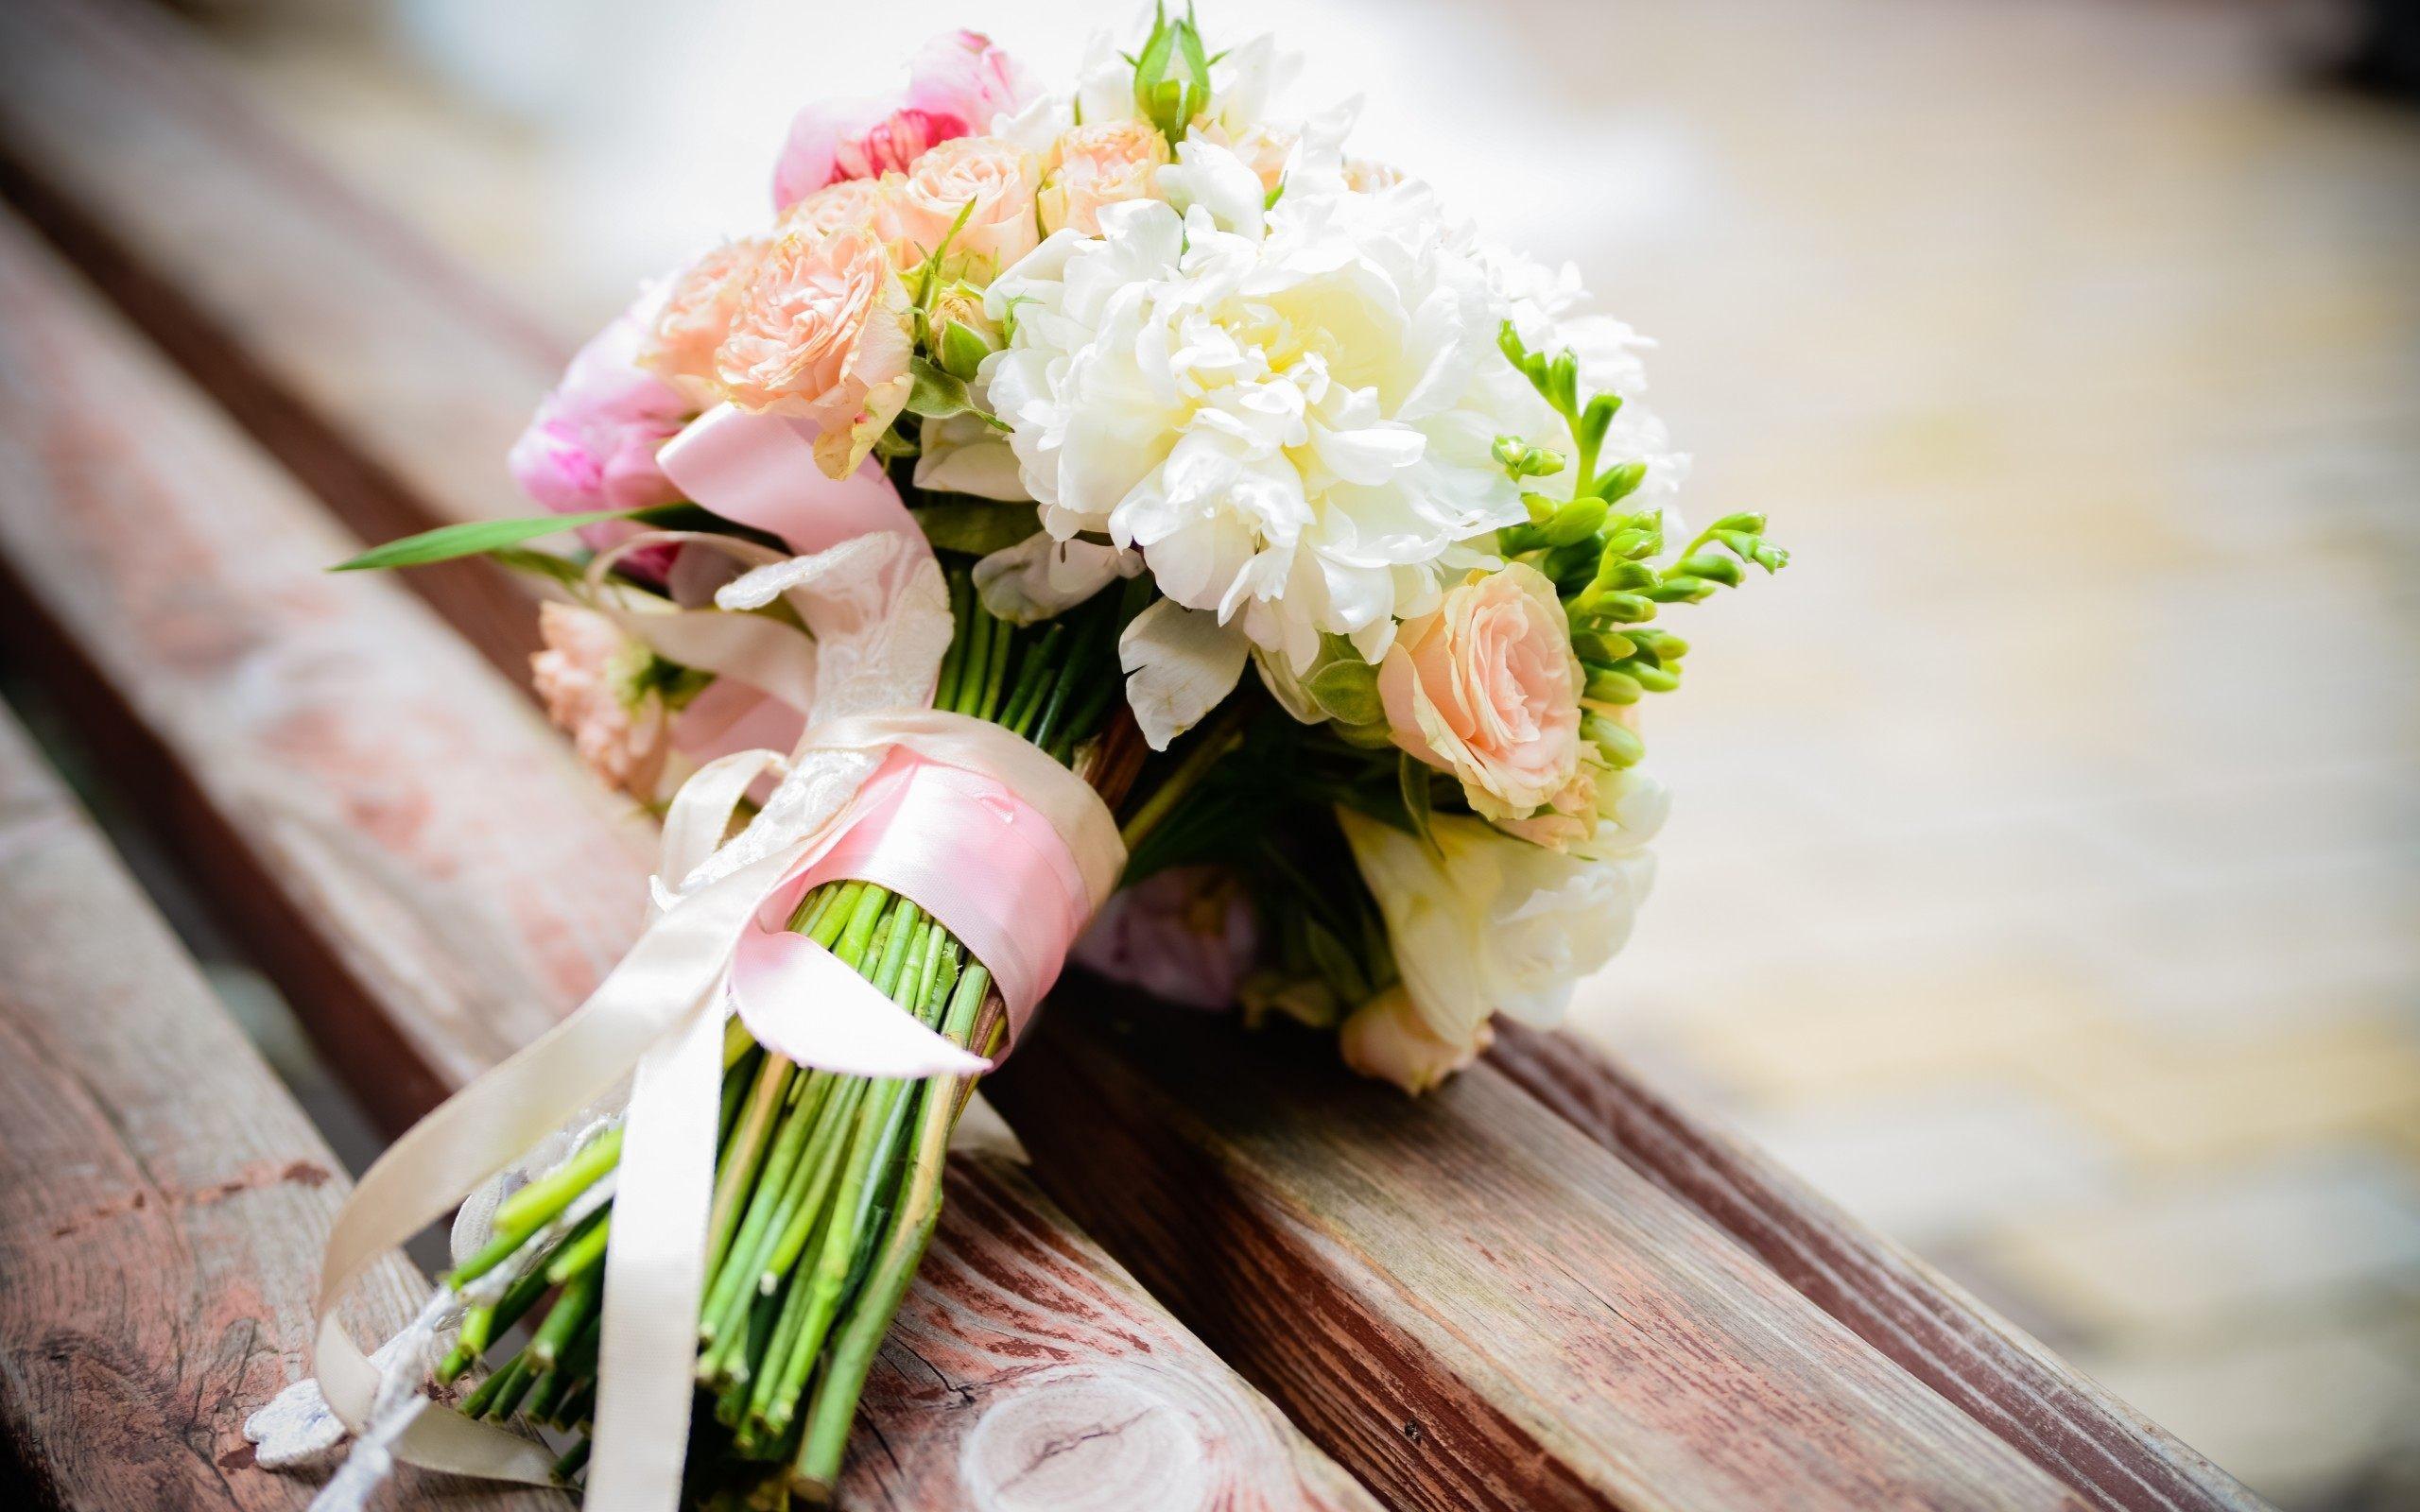 Wedding Flower Wallpaper 50 Images